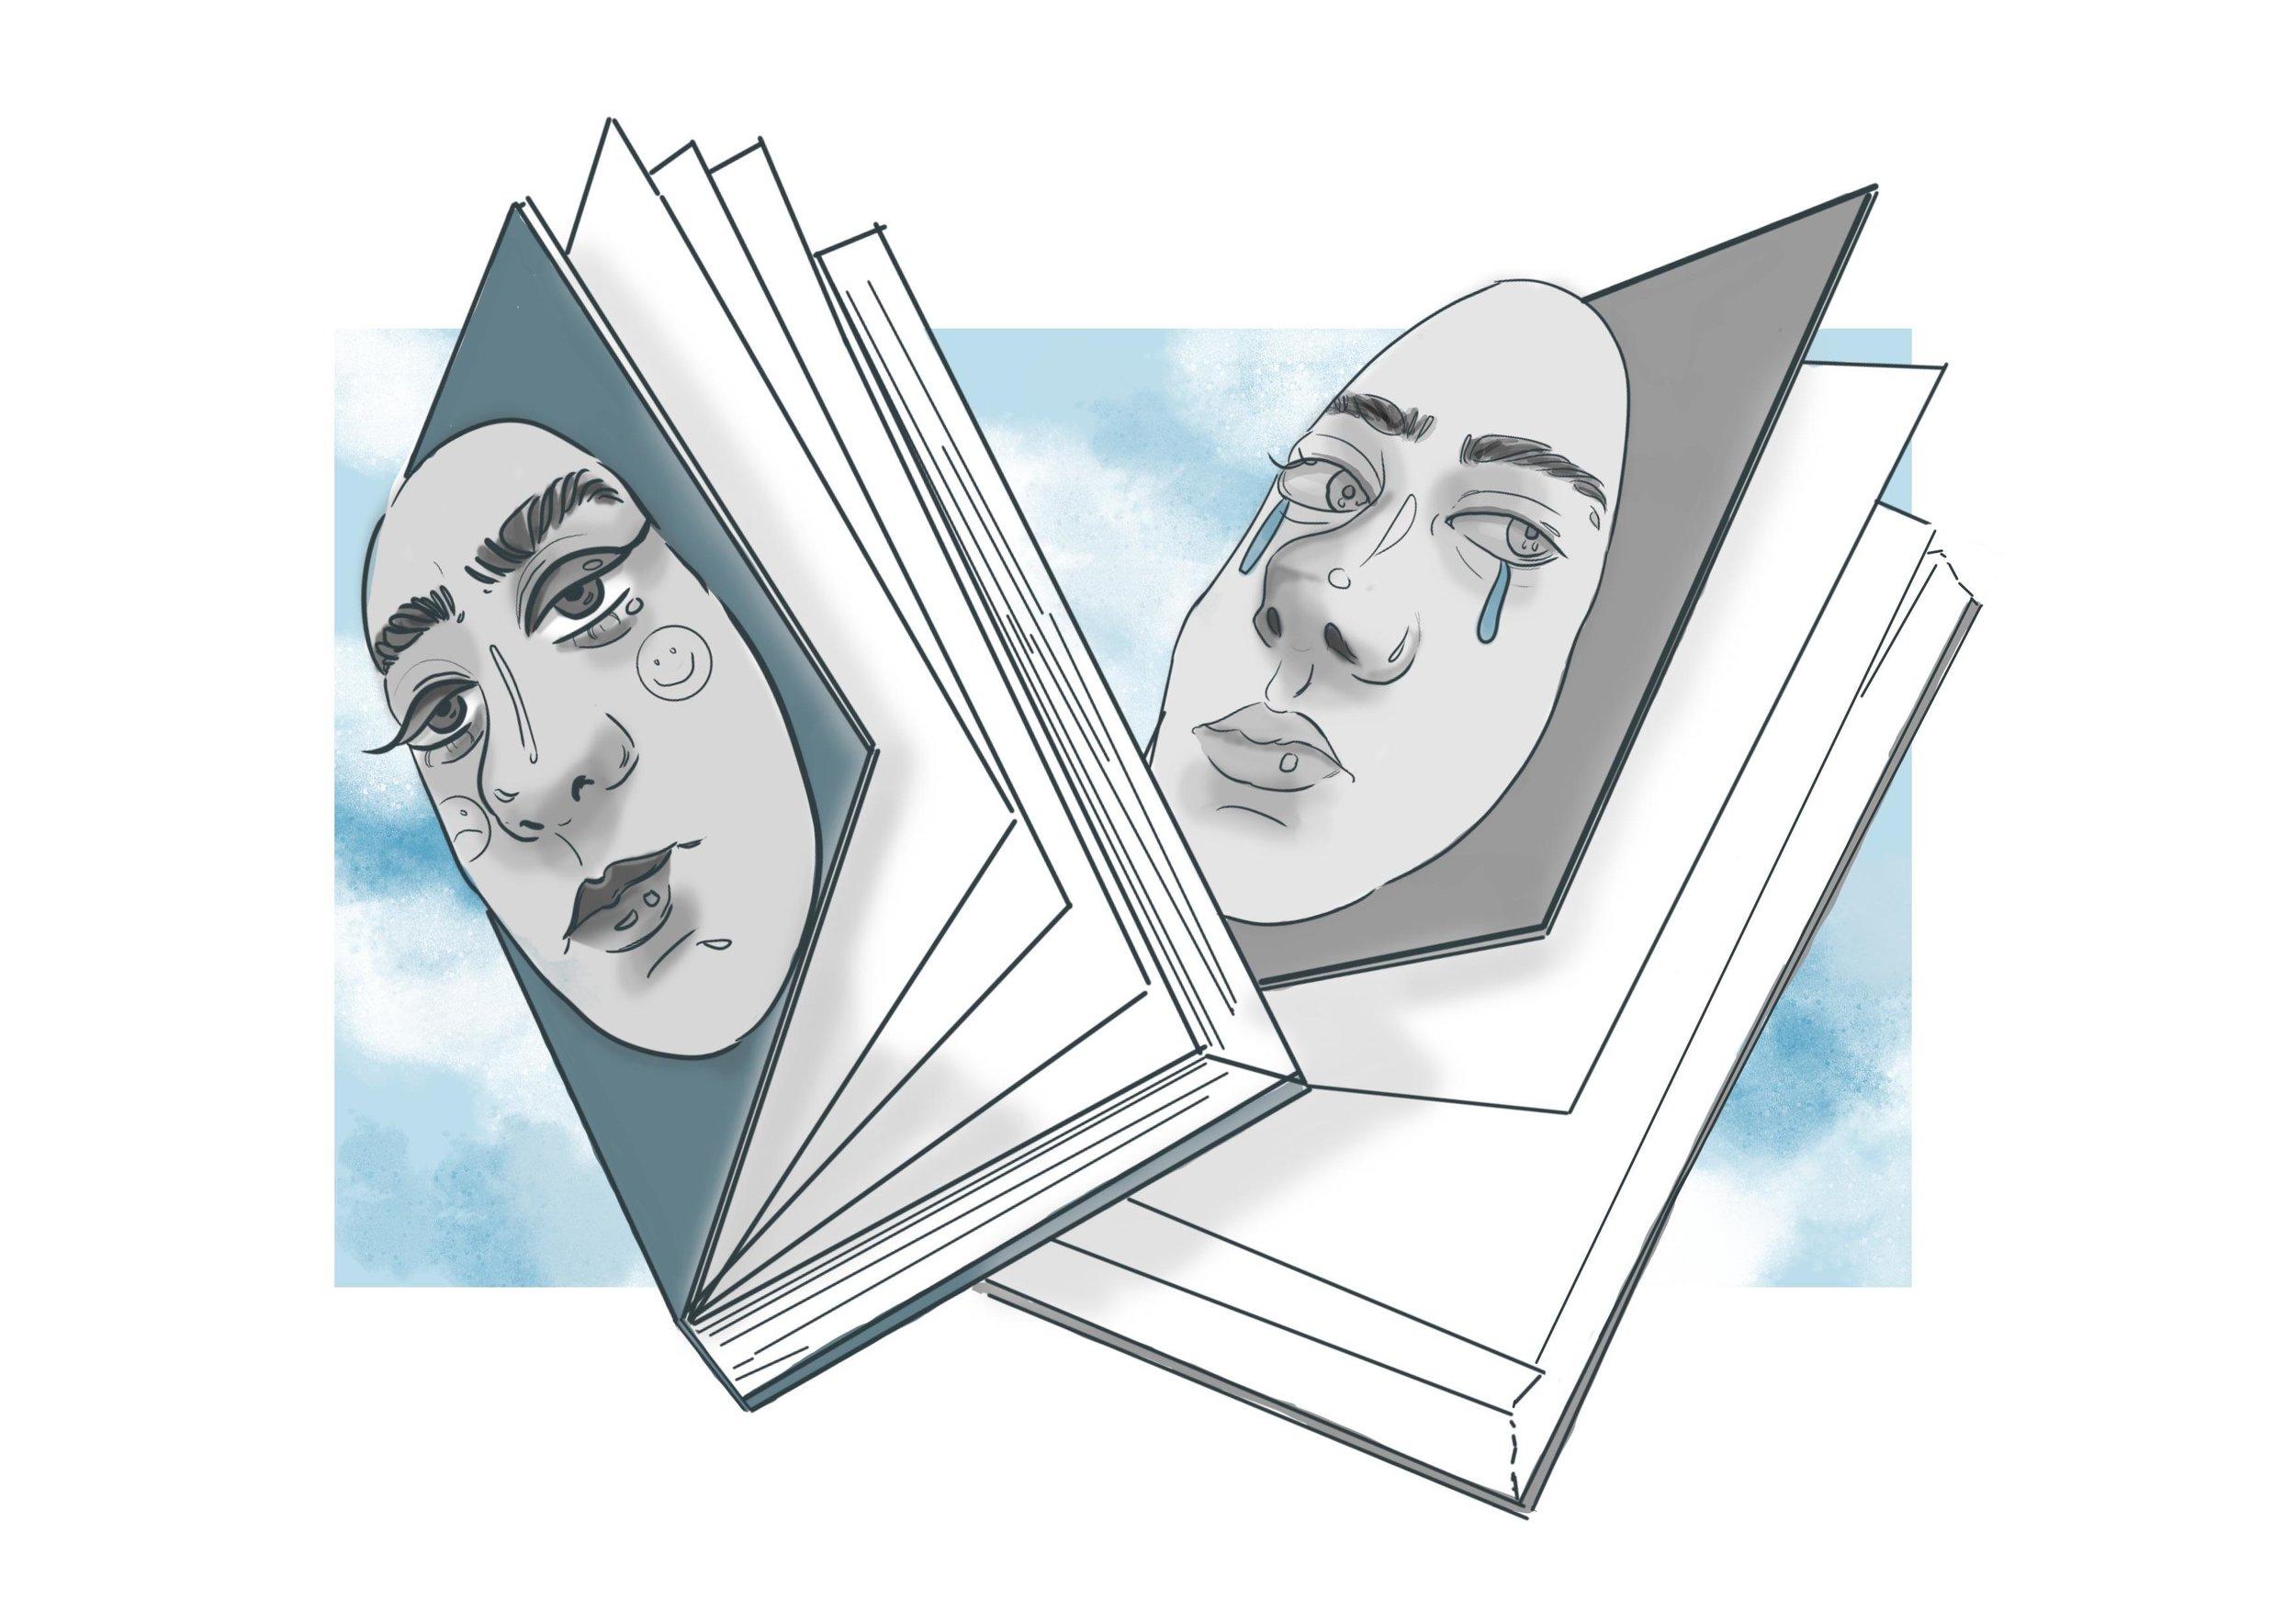 Illustration by Janet Ali